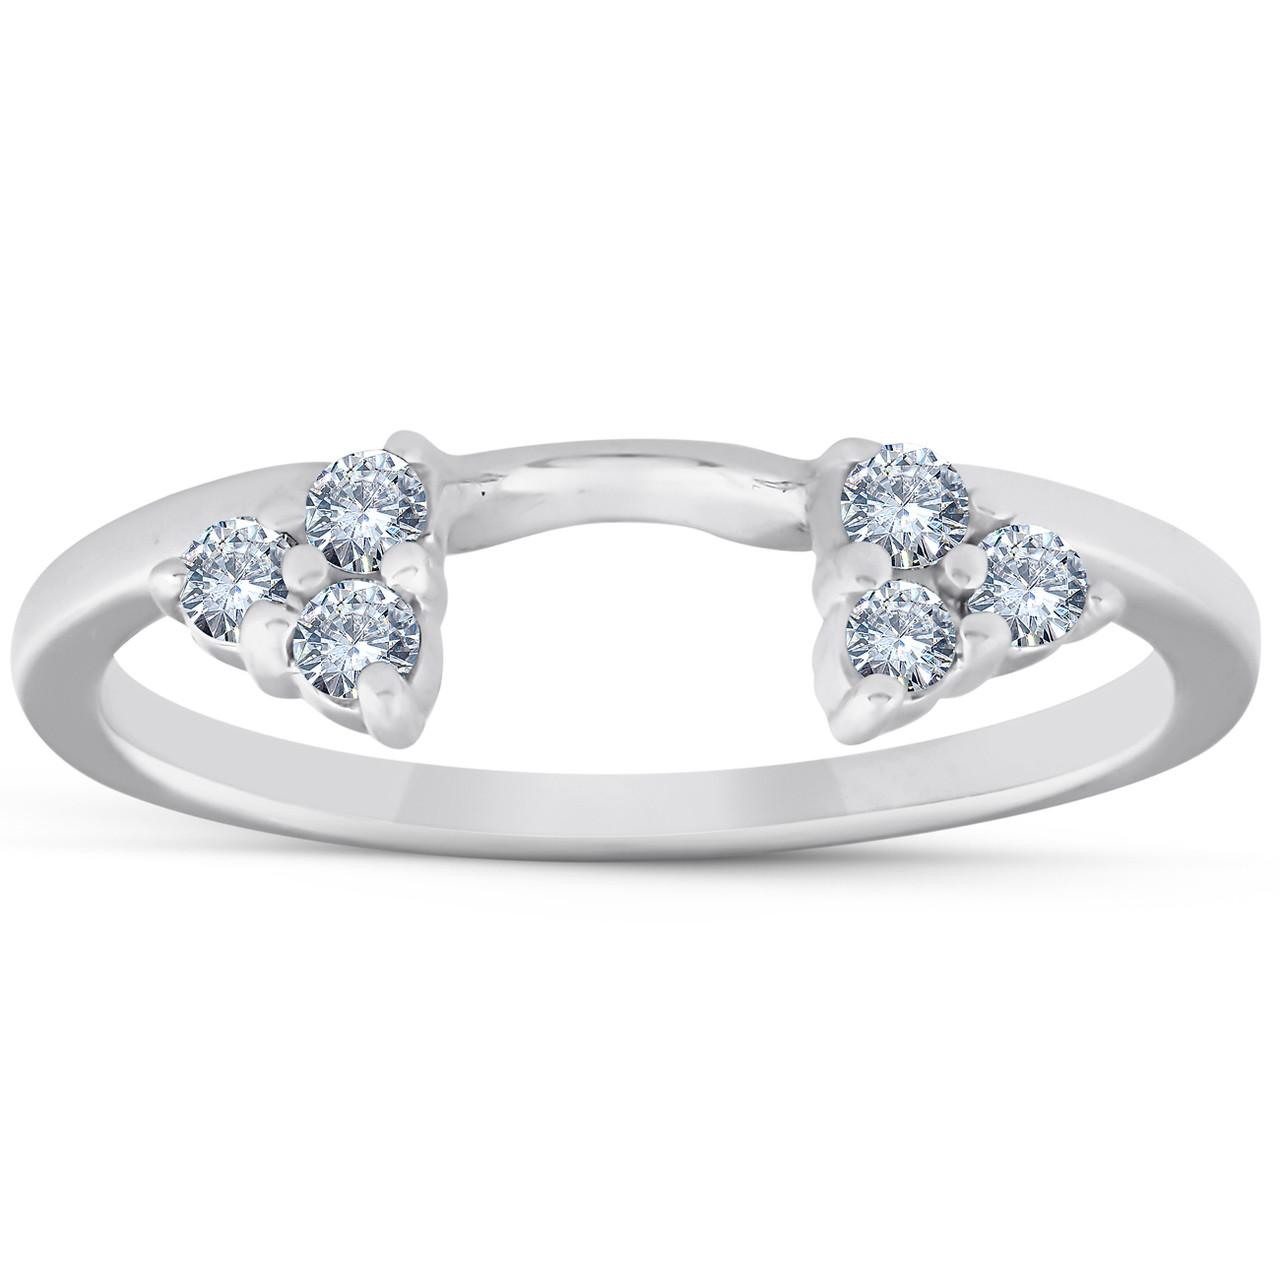 1 4ct Diamond Ring Enhancer Wedding Ring 14k White Gold